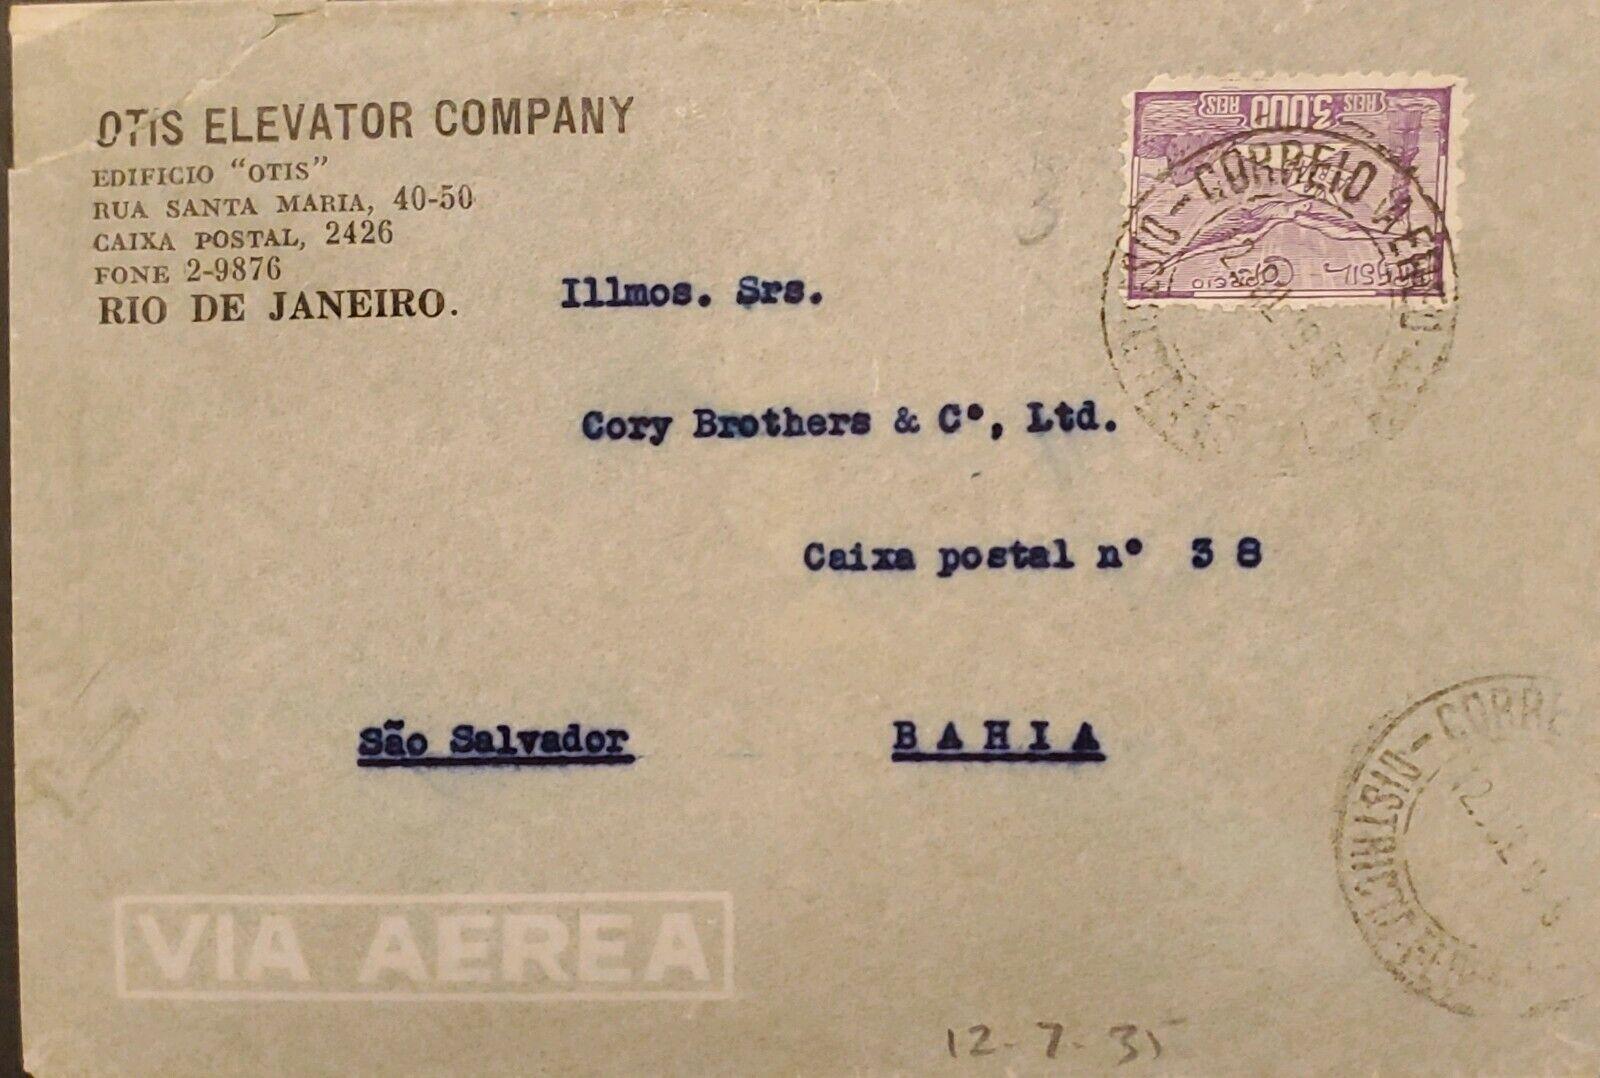 A 1935, BRAZIL, FROM RIO DE JANEIRO TO BAHIA, AIRMAIL, AVIATION STAMP - $25.00